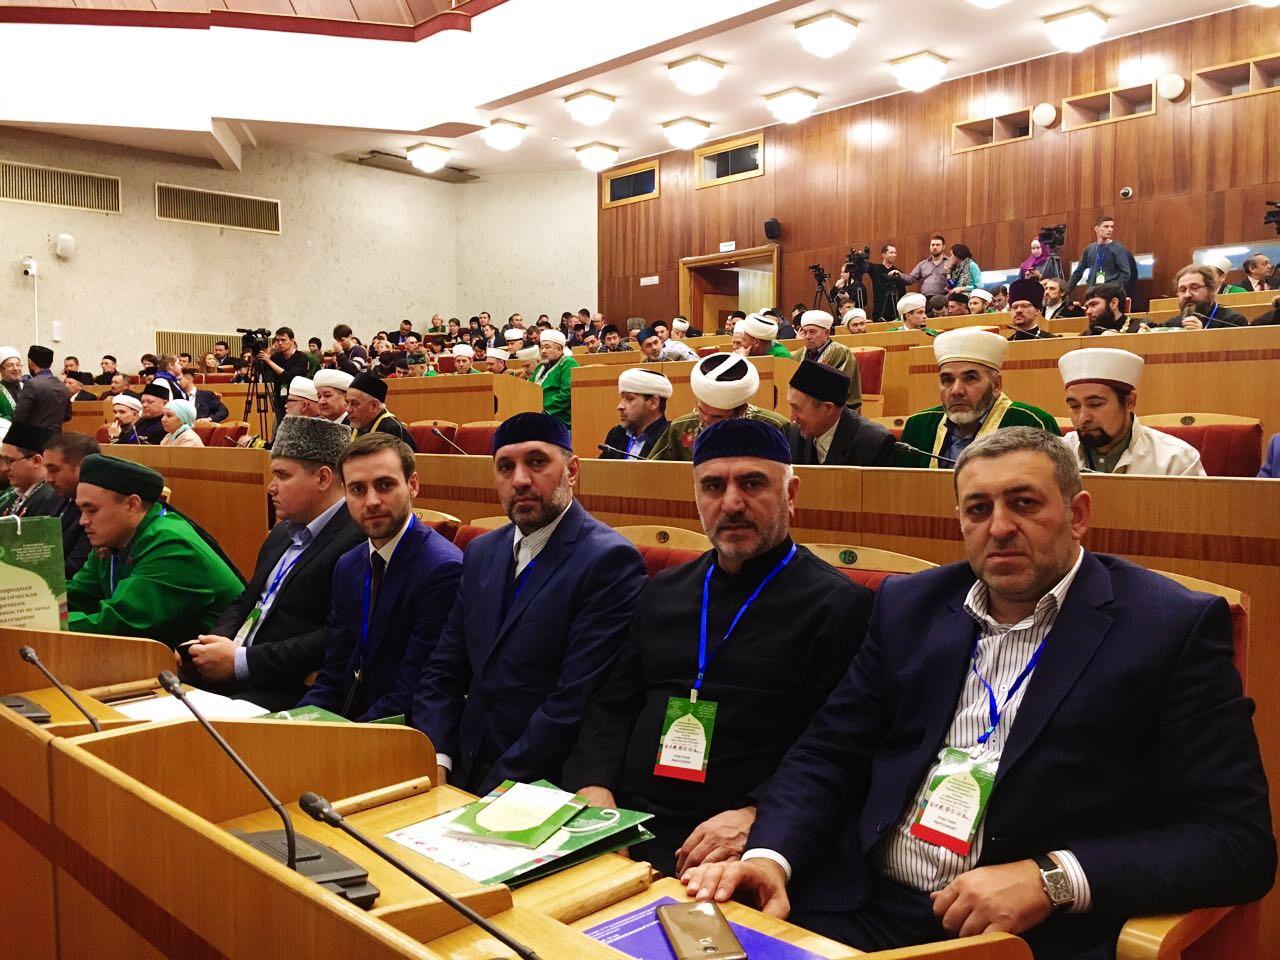 http://islamission.ru/wp-content/uploads/2017/10/IMG_3534.jpg